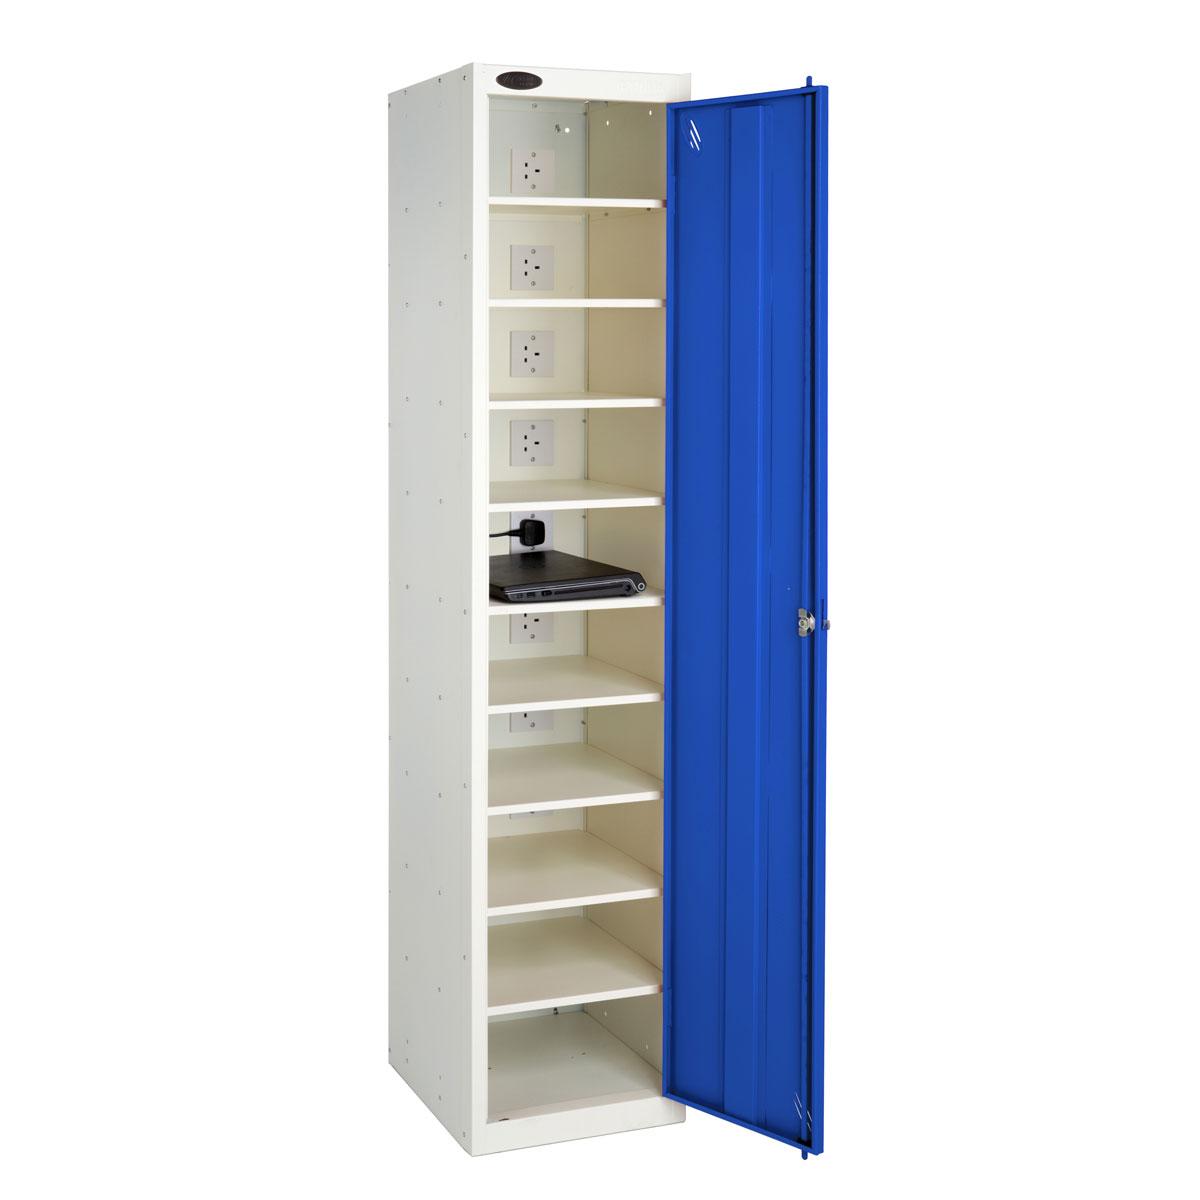 Nuwco laplocker 10 10 bay laptop locker with key lock Storage bay